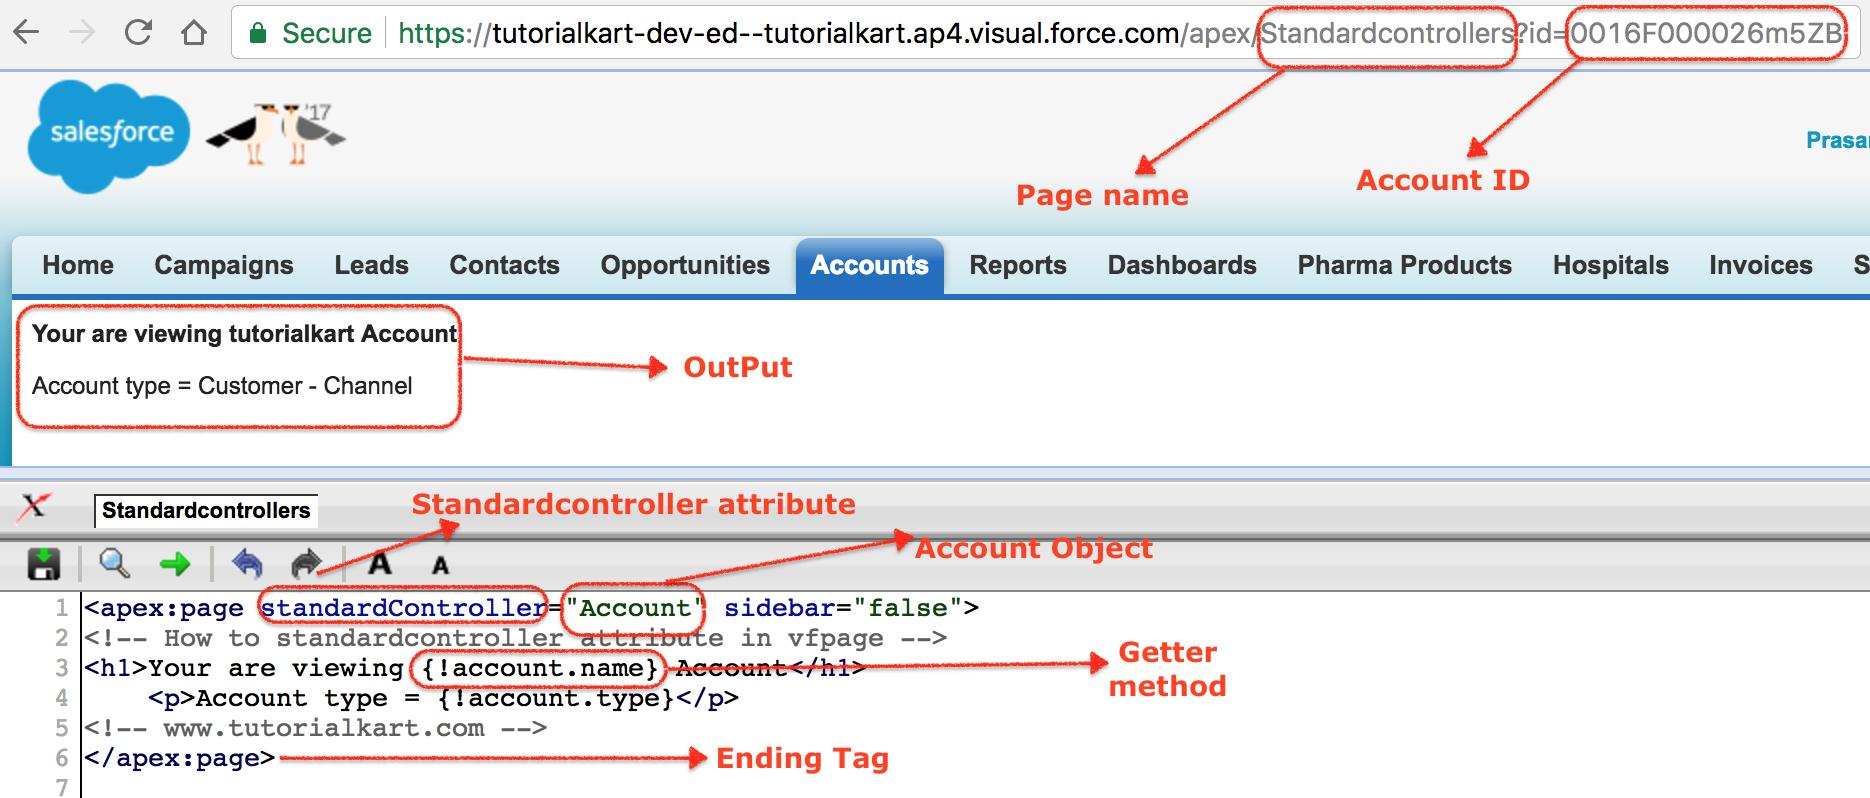 Standard Controller in Salesforce - StandardController attribute